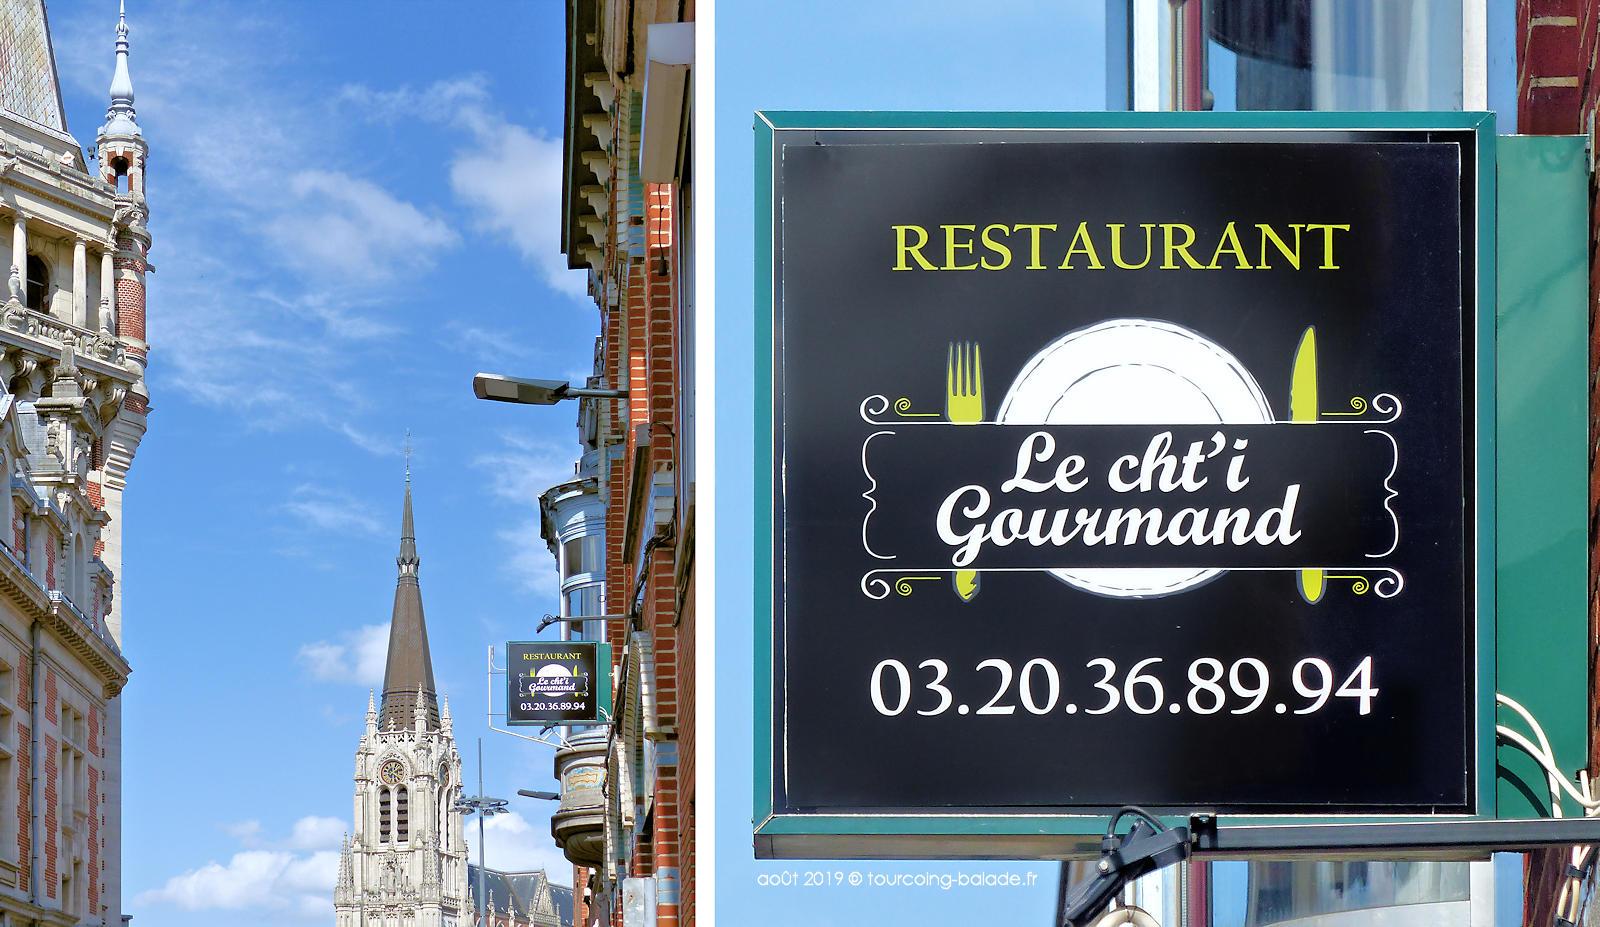 Restaurant Ch'ti Gourmand, Tourcoing centre.